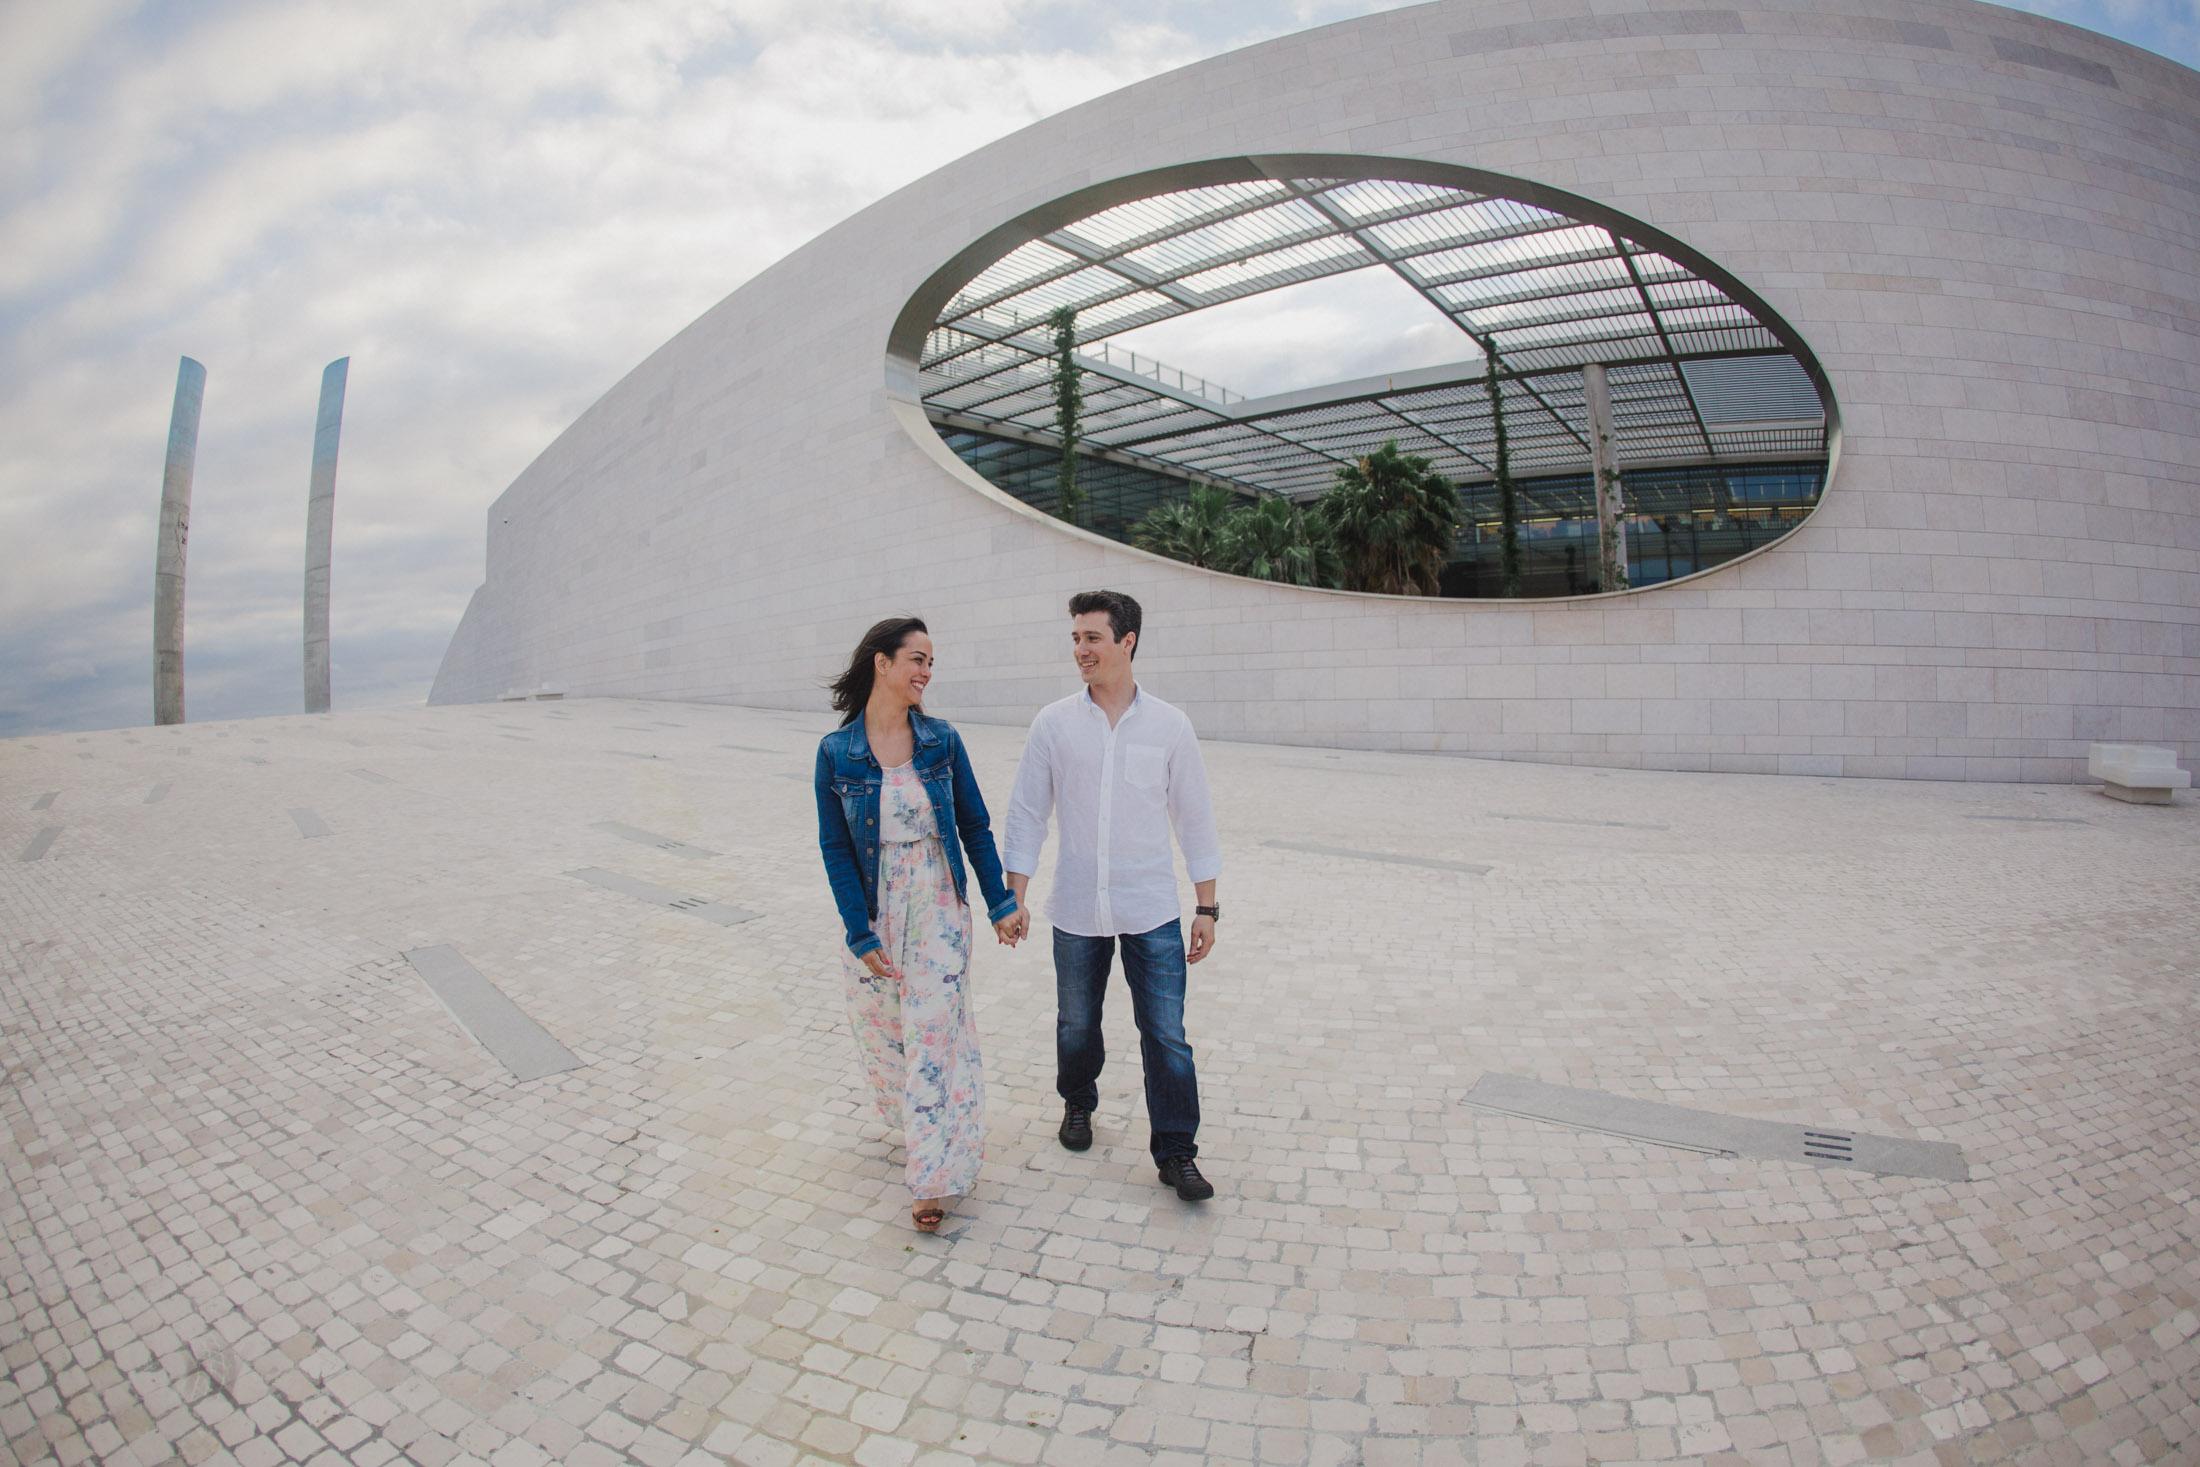 23 engagement-love-session-fundacao-Champalimaud-Filipe-Santiago-Fotografia-Lisboa-Mafra-Malveira-Fotografo